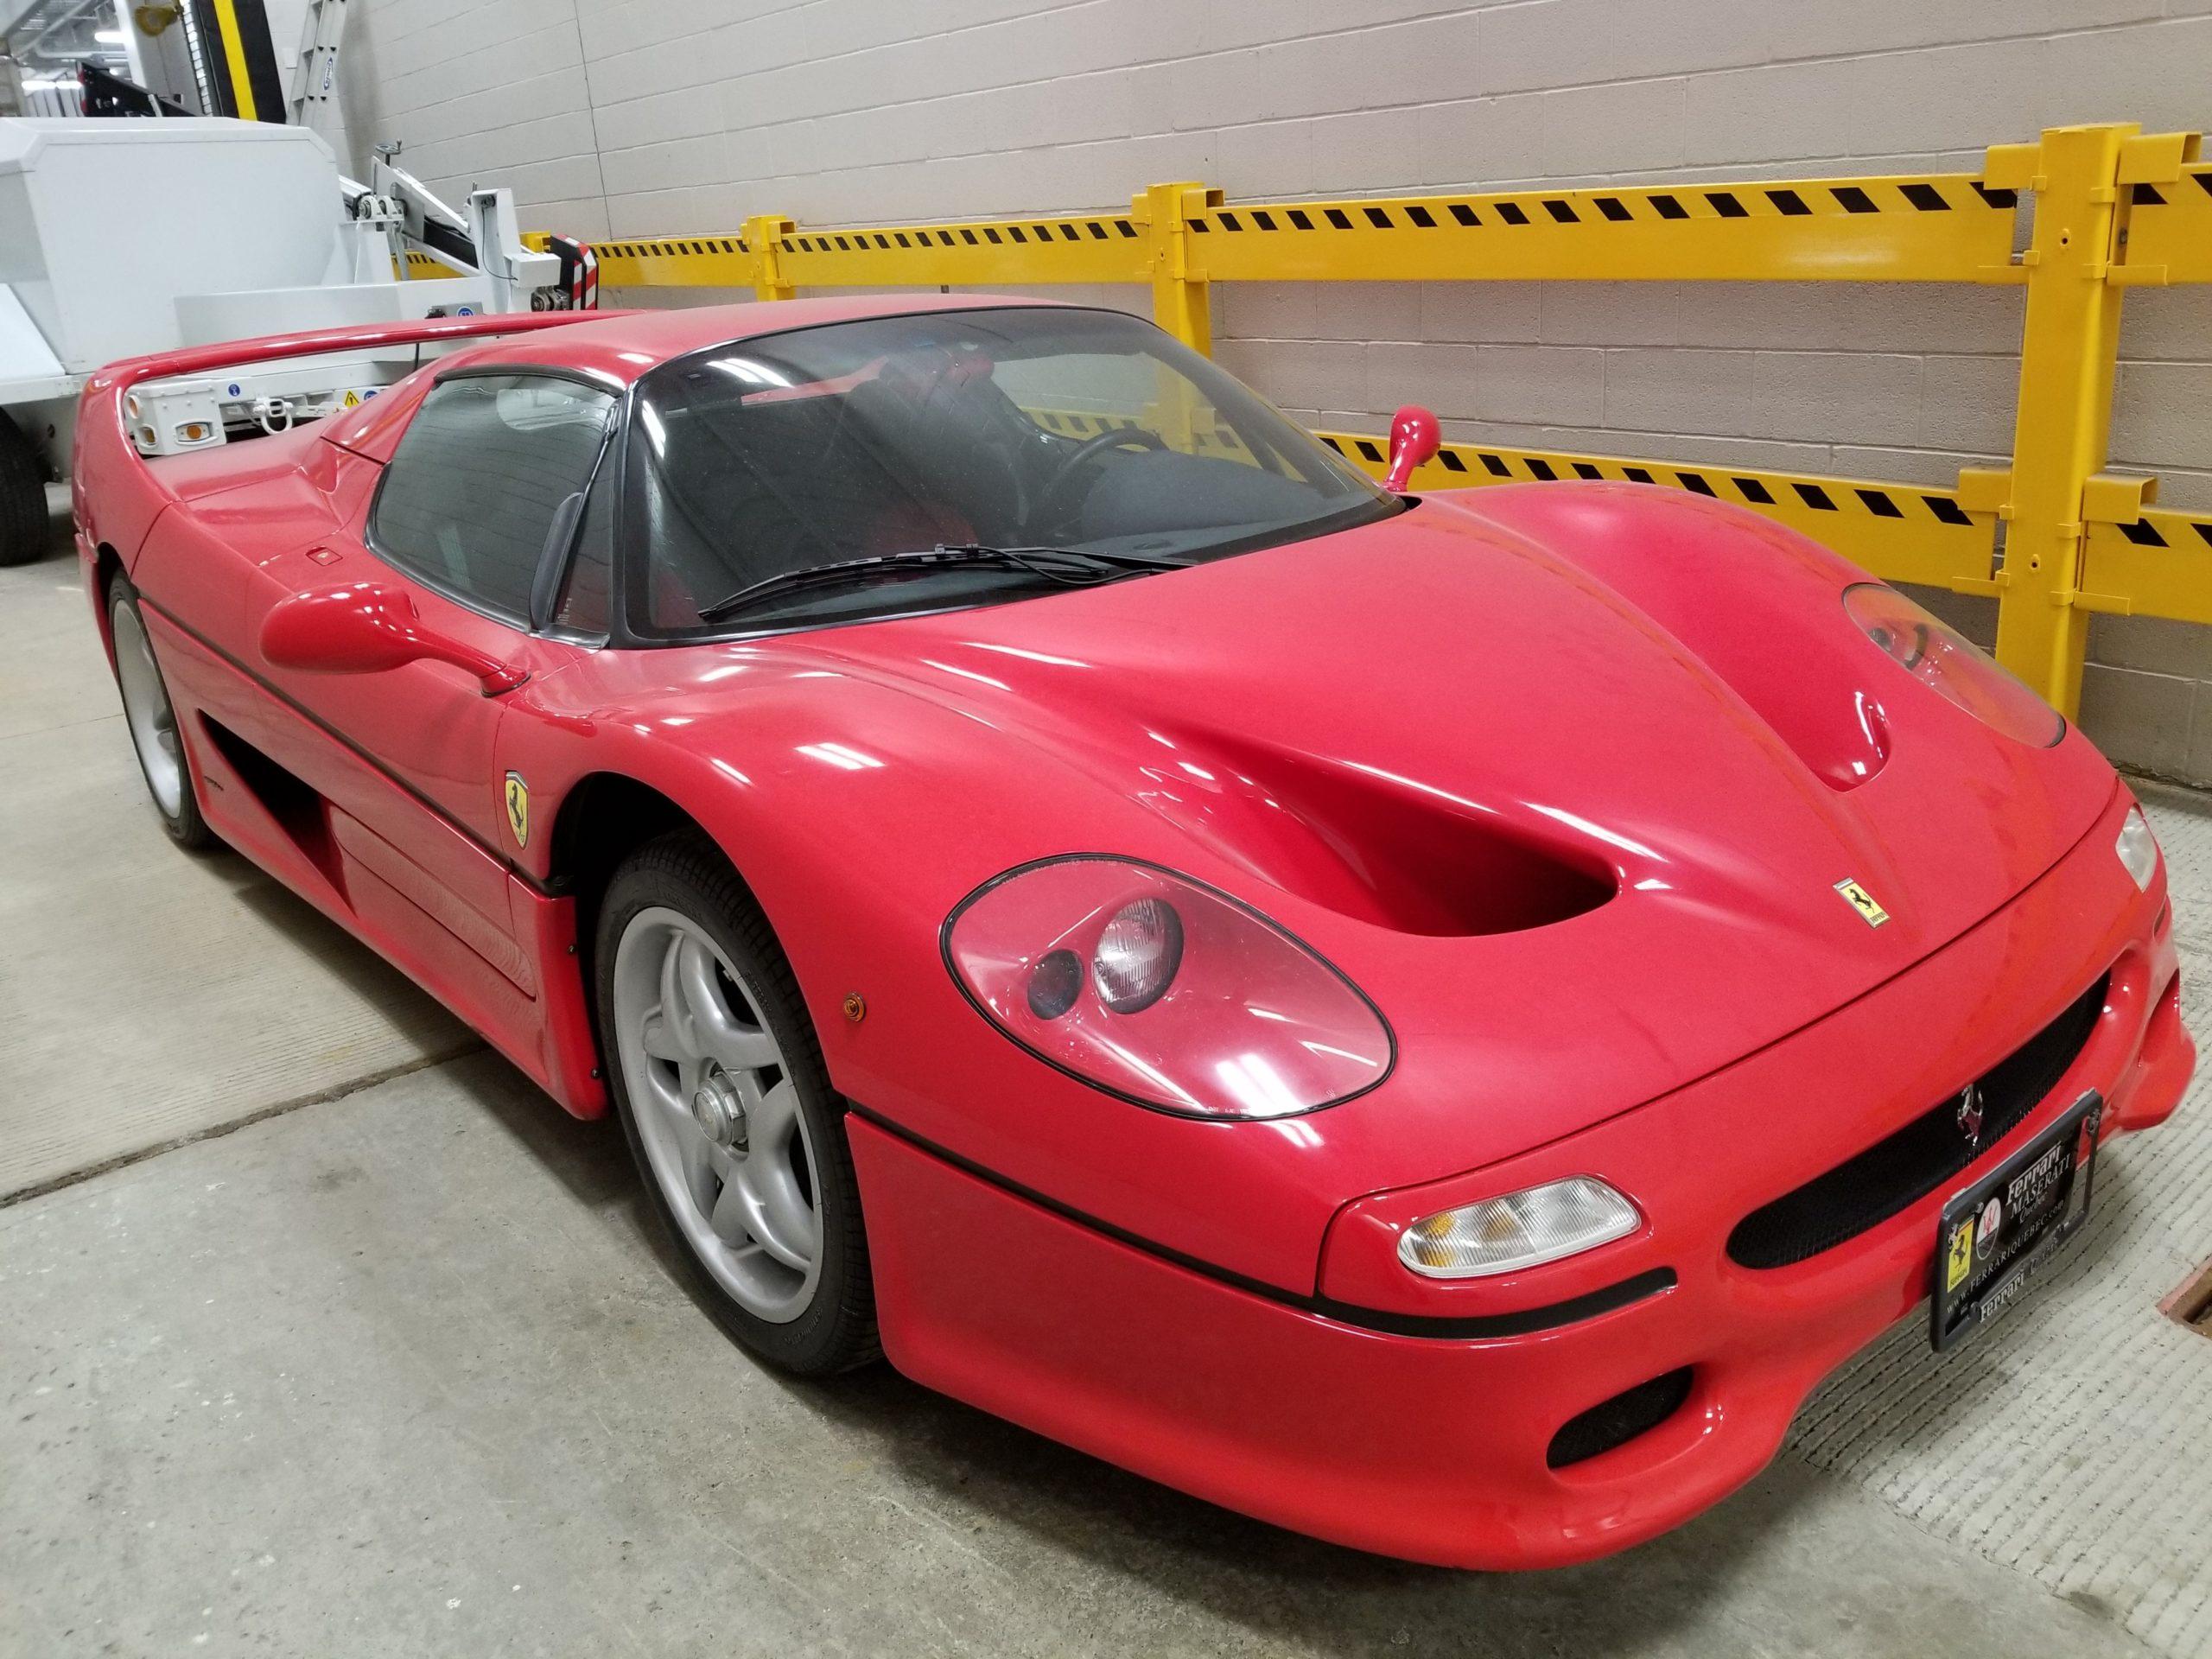 Police In New York Recover Ferrari F50 Stolen 18 Years Ago In Italy Gtspirit